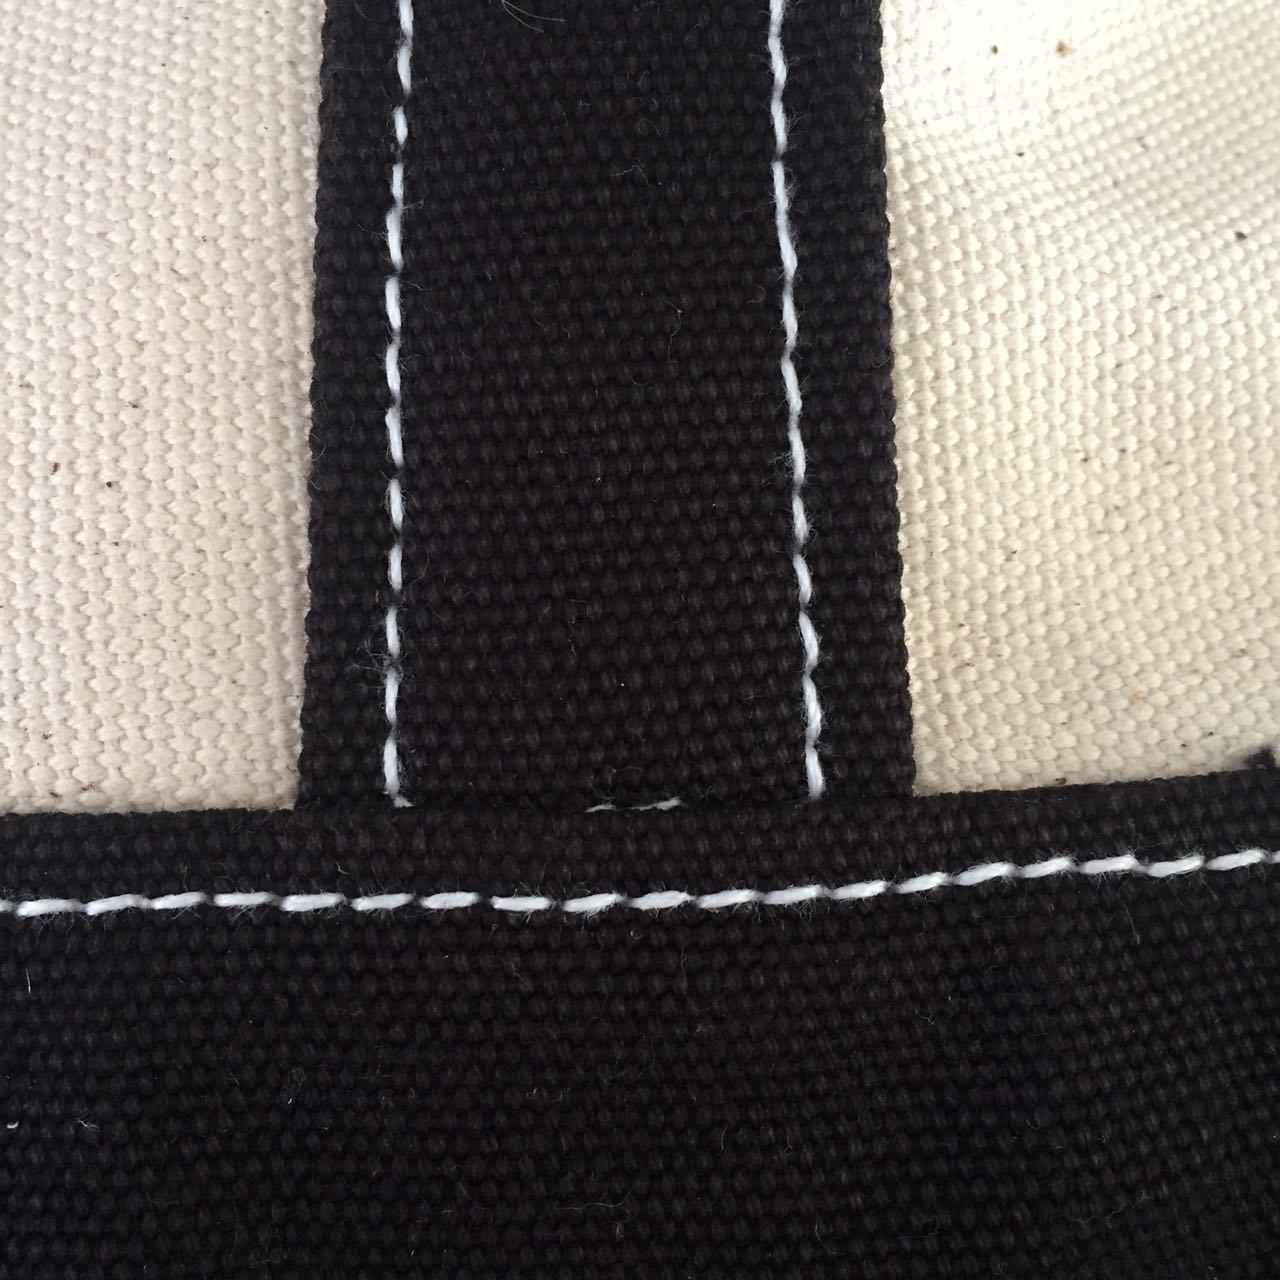 16oz/20oz High Quality Shoulder Handle Canvas Tote Bag